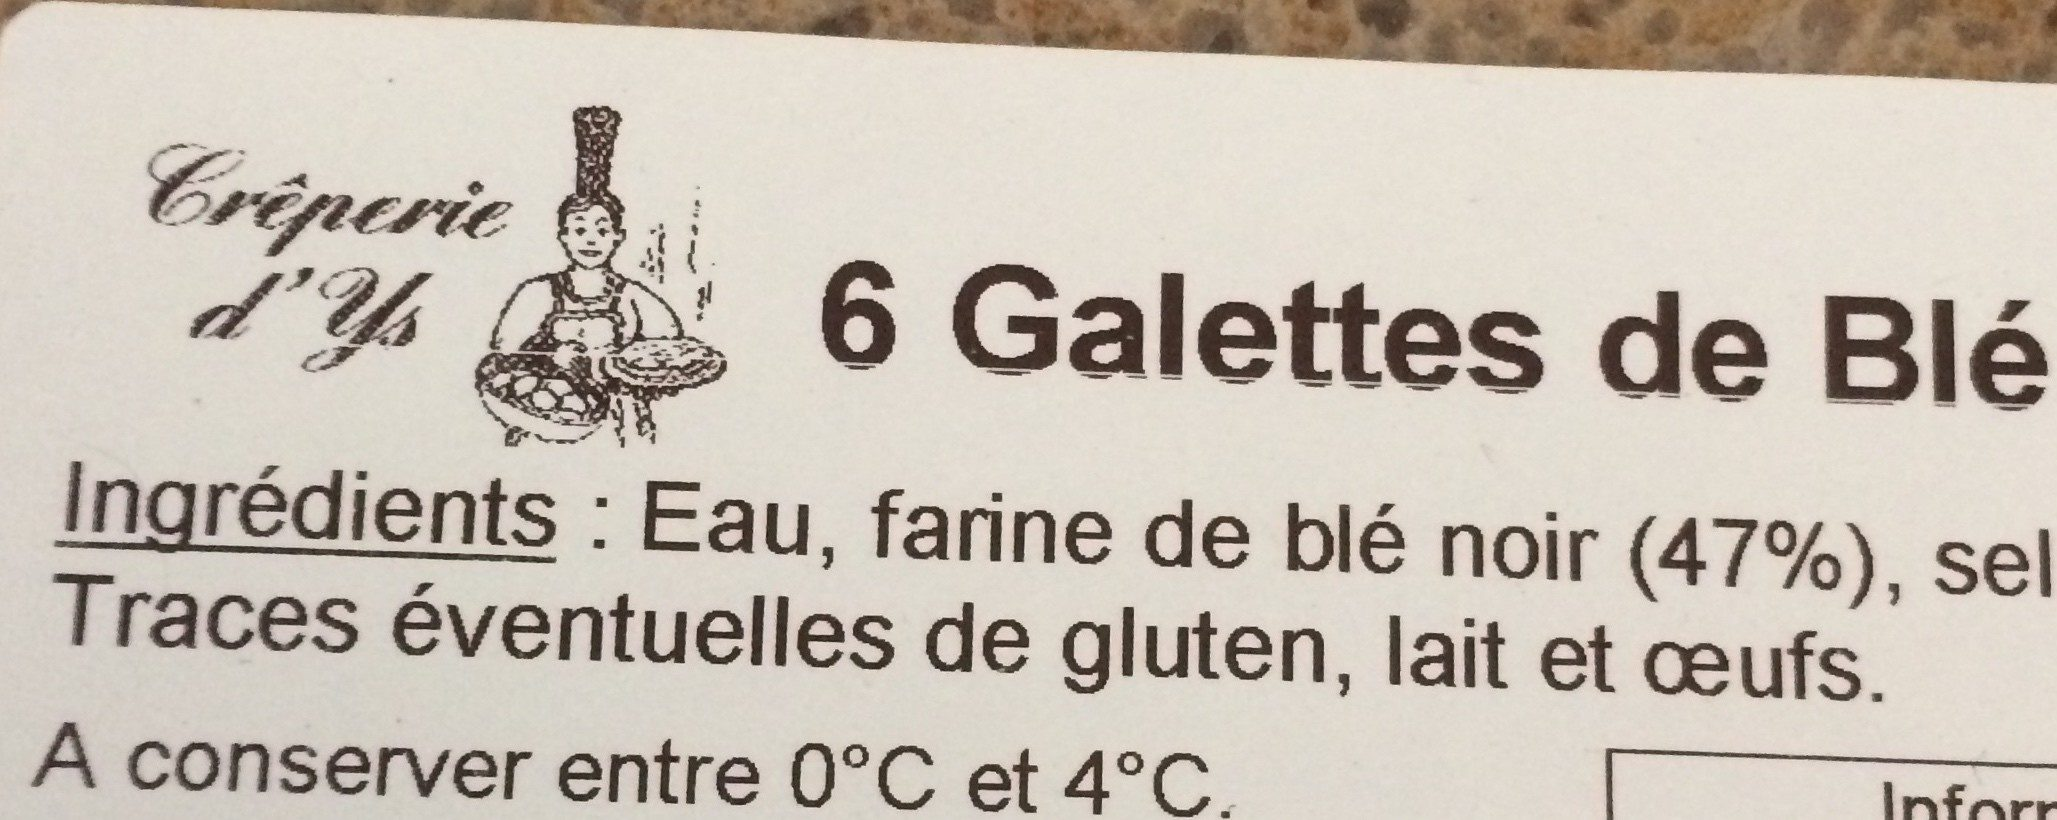 Galettes blé noir - Ingrediënten - fr